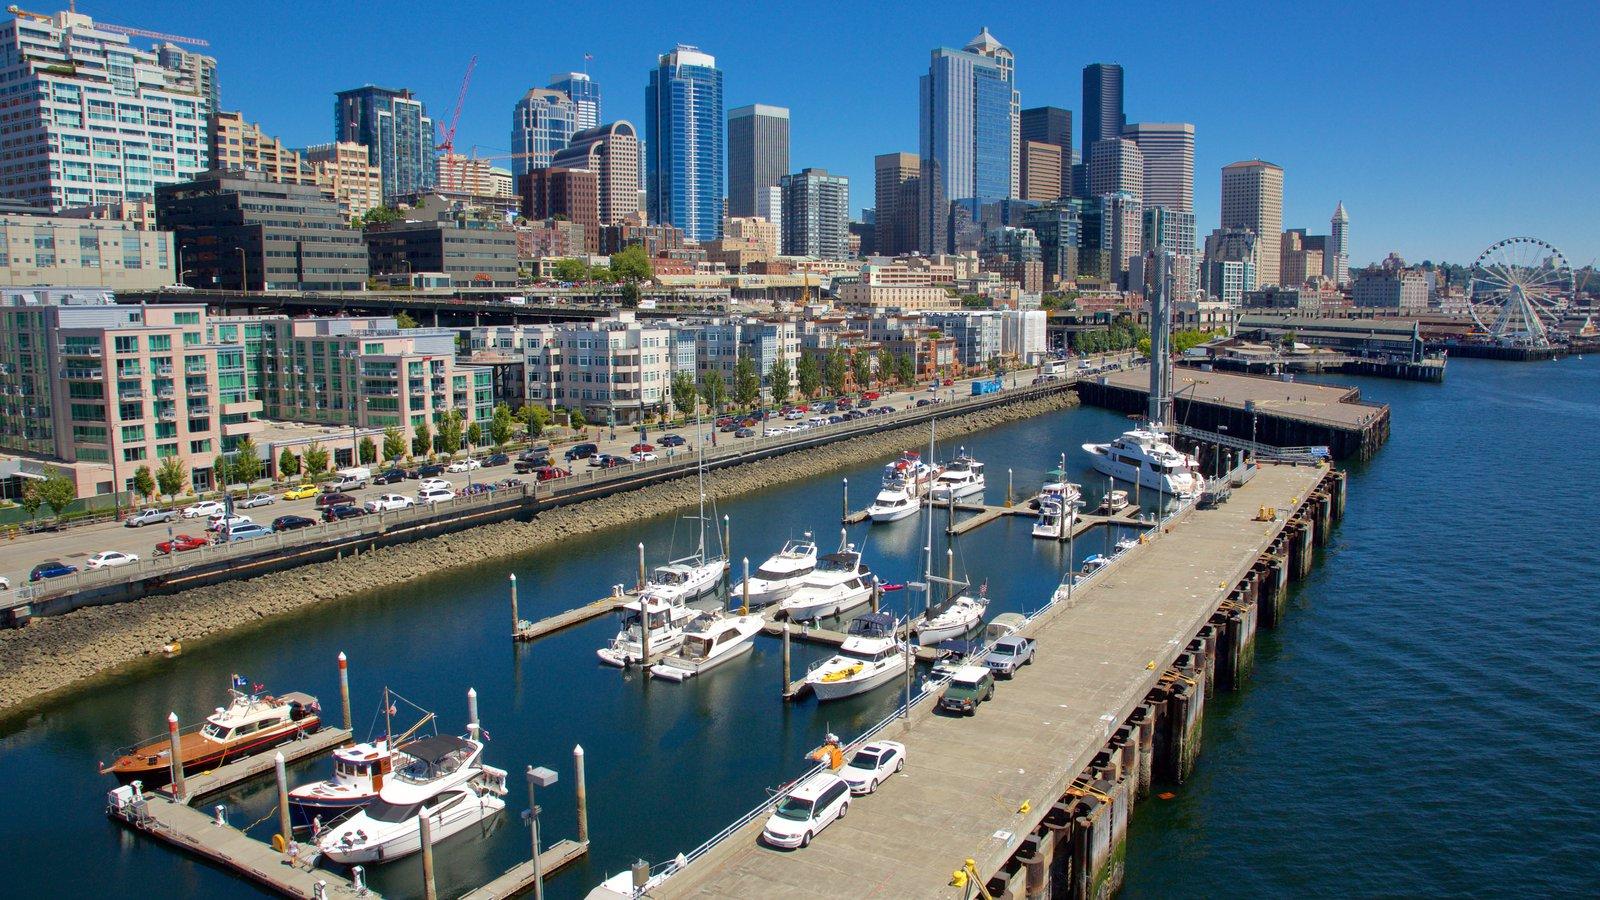 Seattle Waterfront caracterizando cbd, vela e uma marina